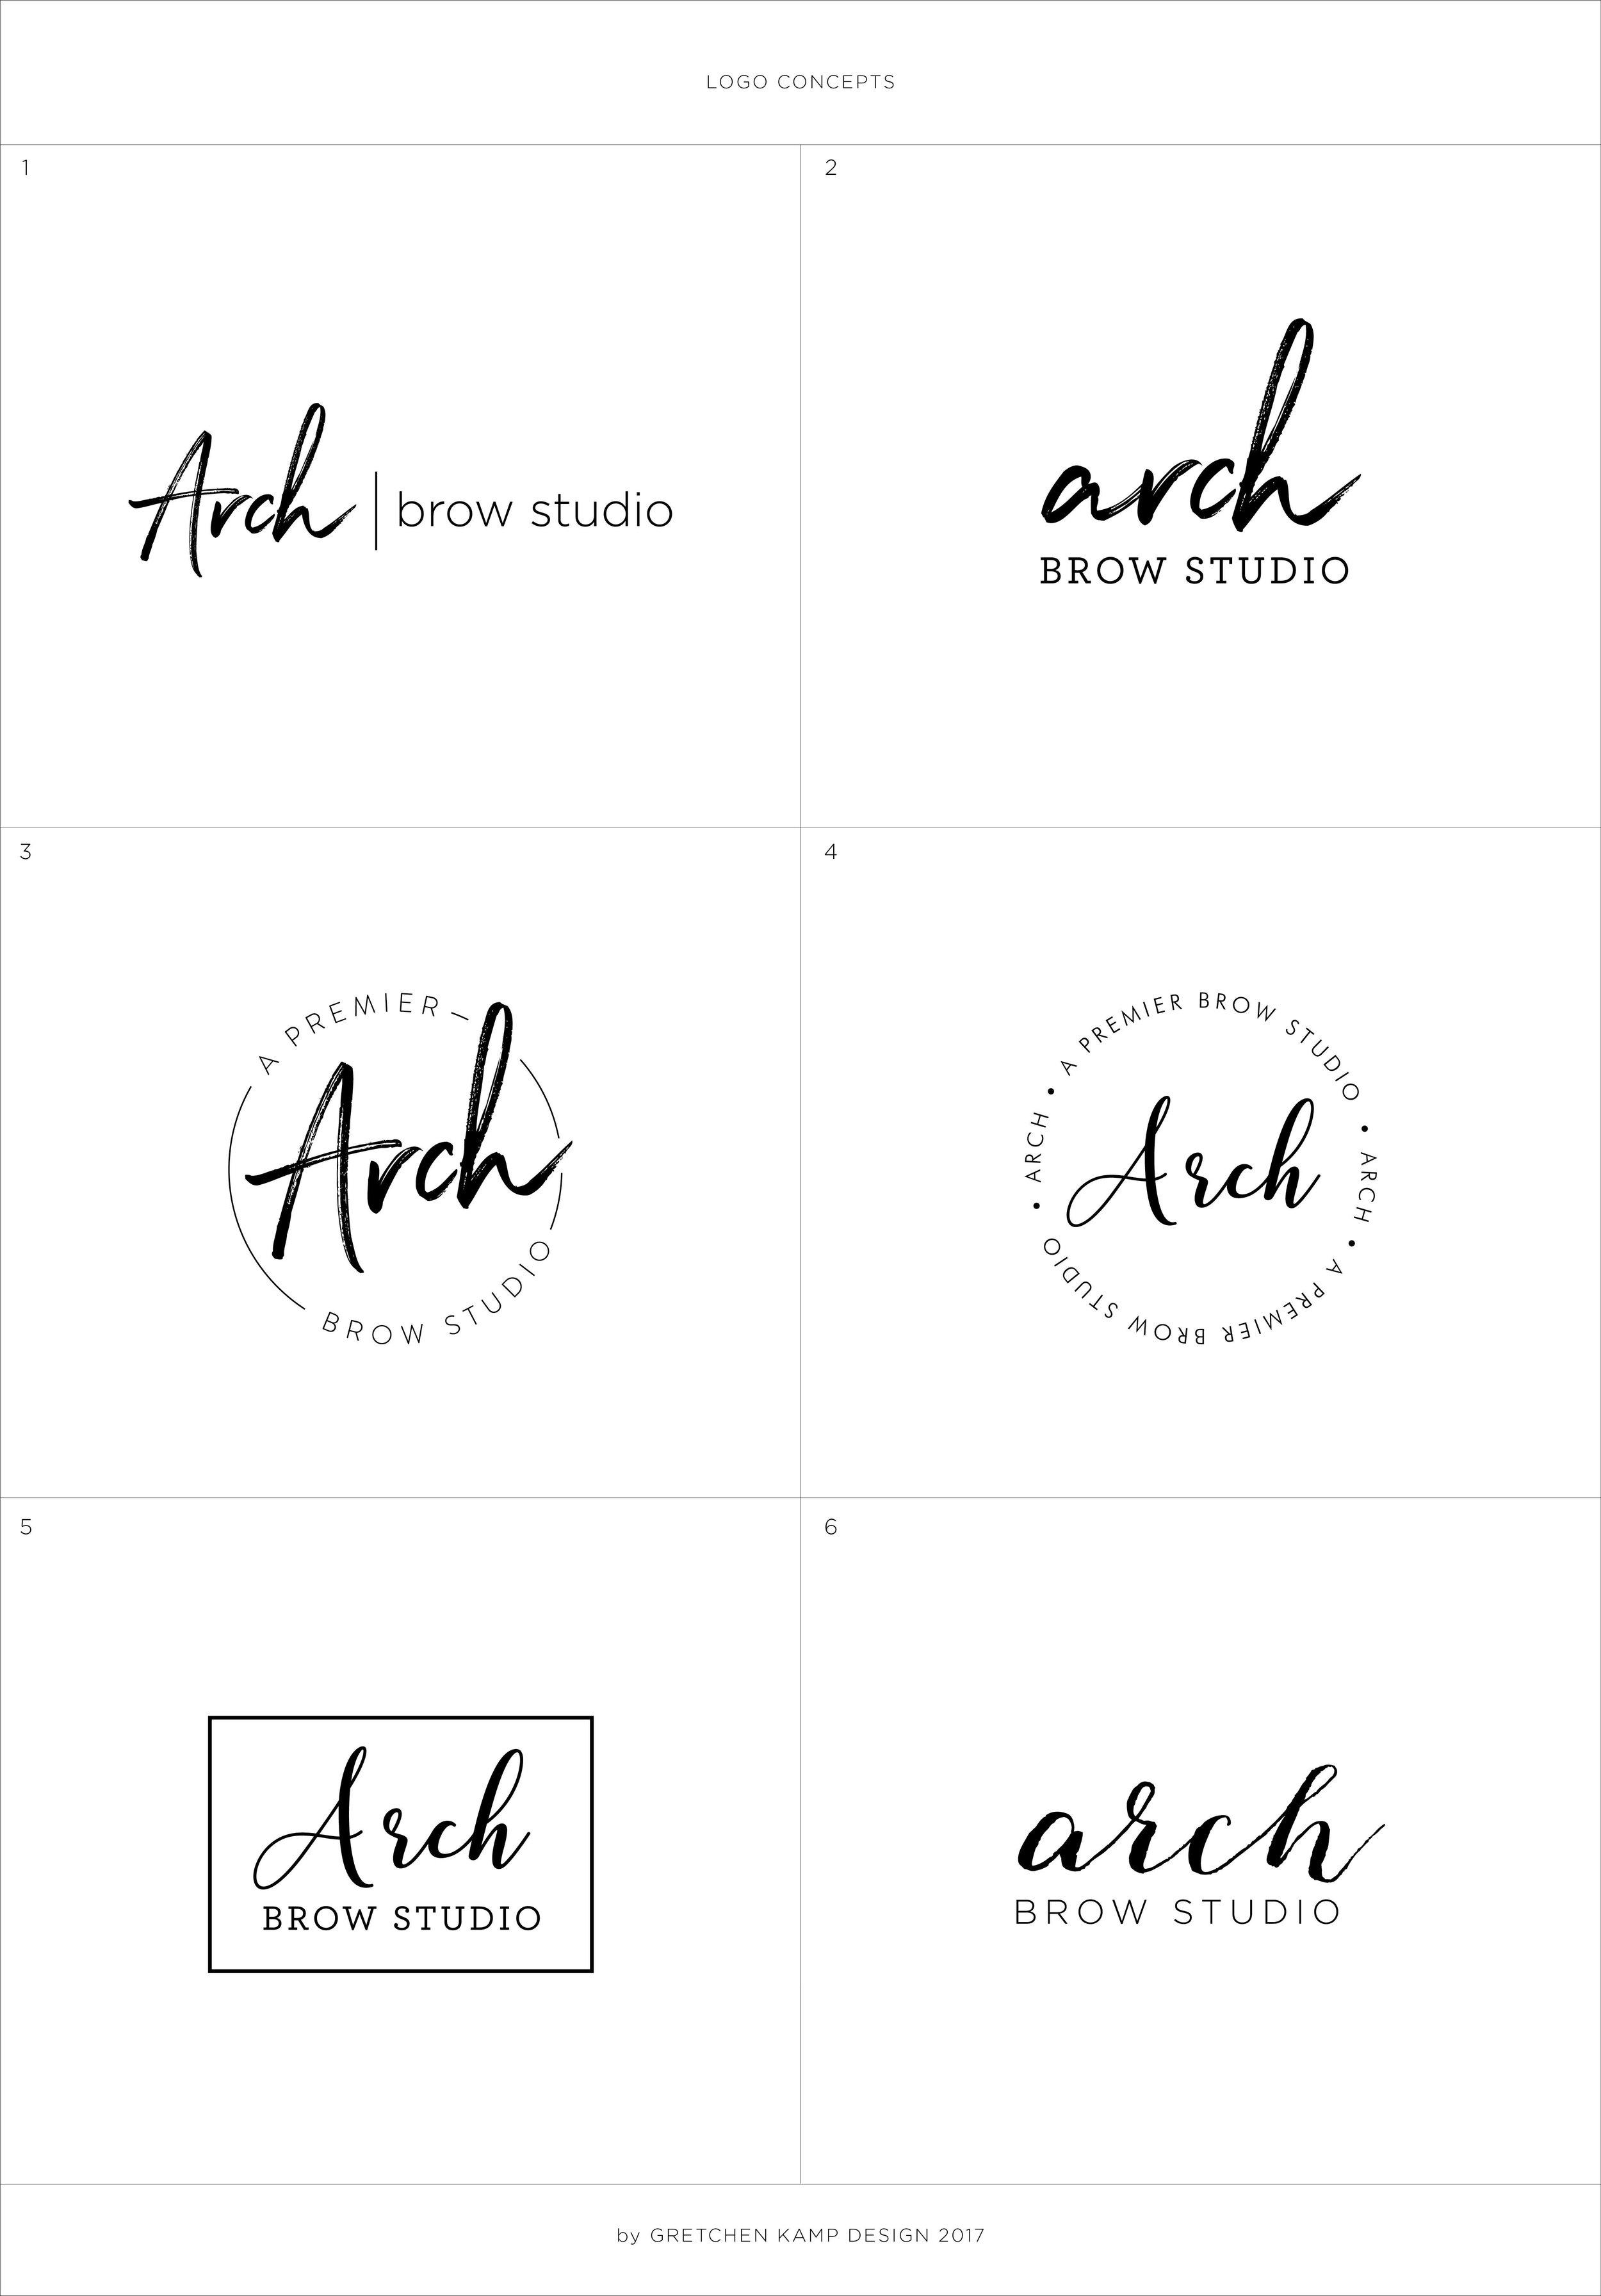 arch_logoconcepts.jpg